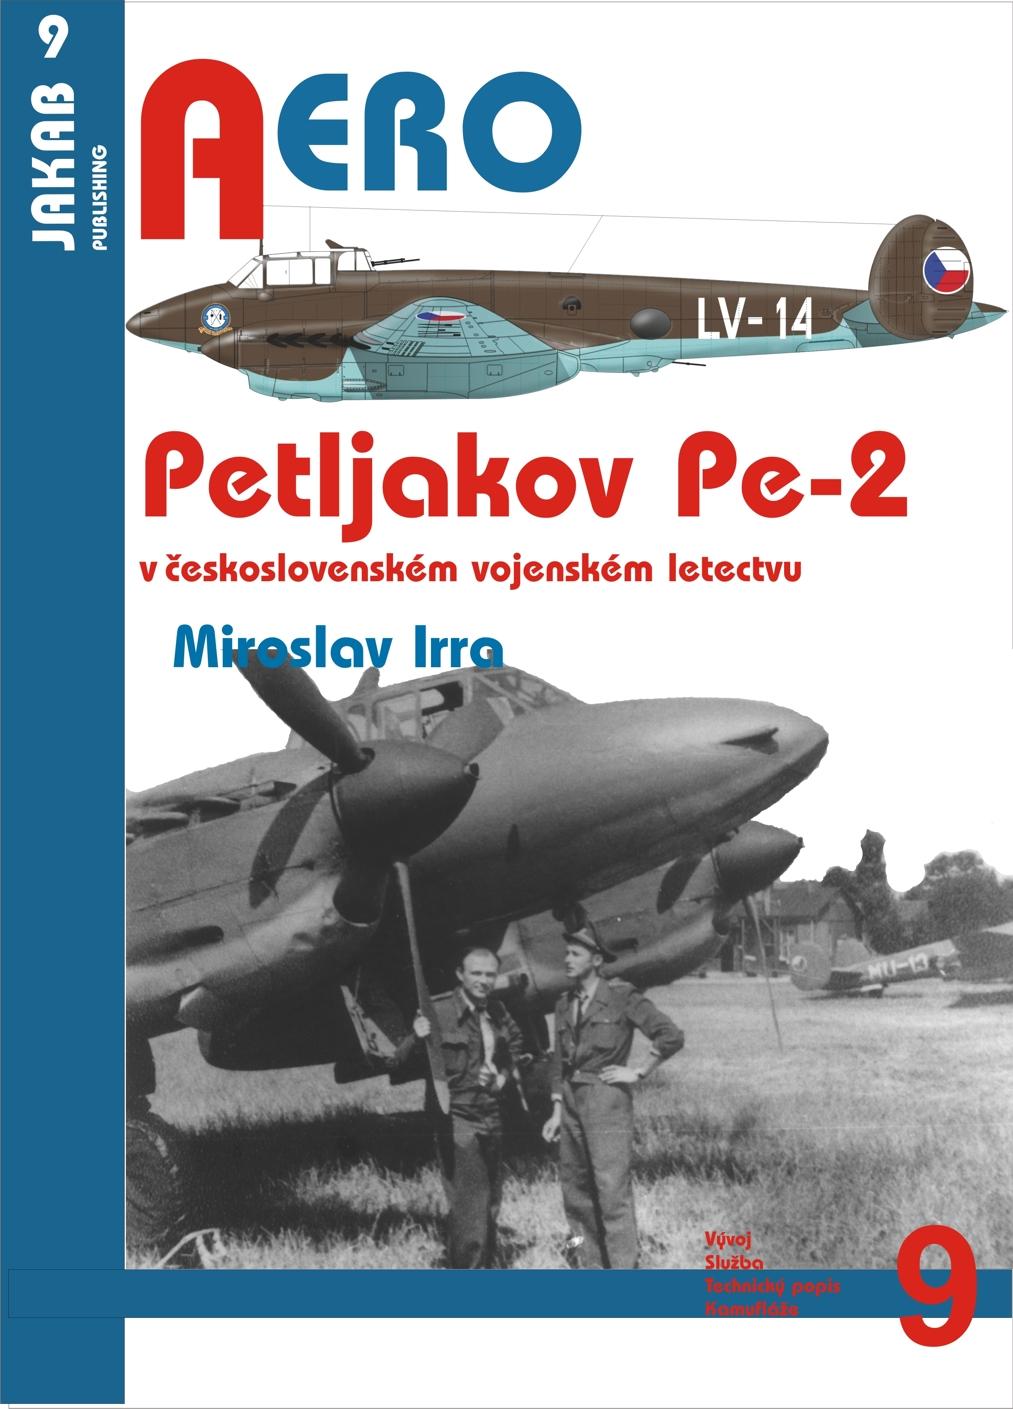 fcdn.valka.cz/attachments/6928/Aero_Jakab_9_Petljakov_Pe-2_v___eskoslovensk__m_letectvu.jpg